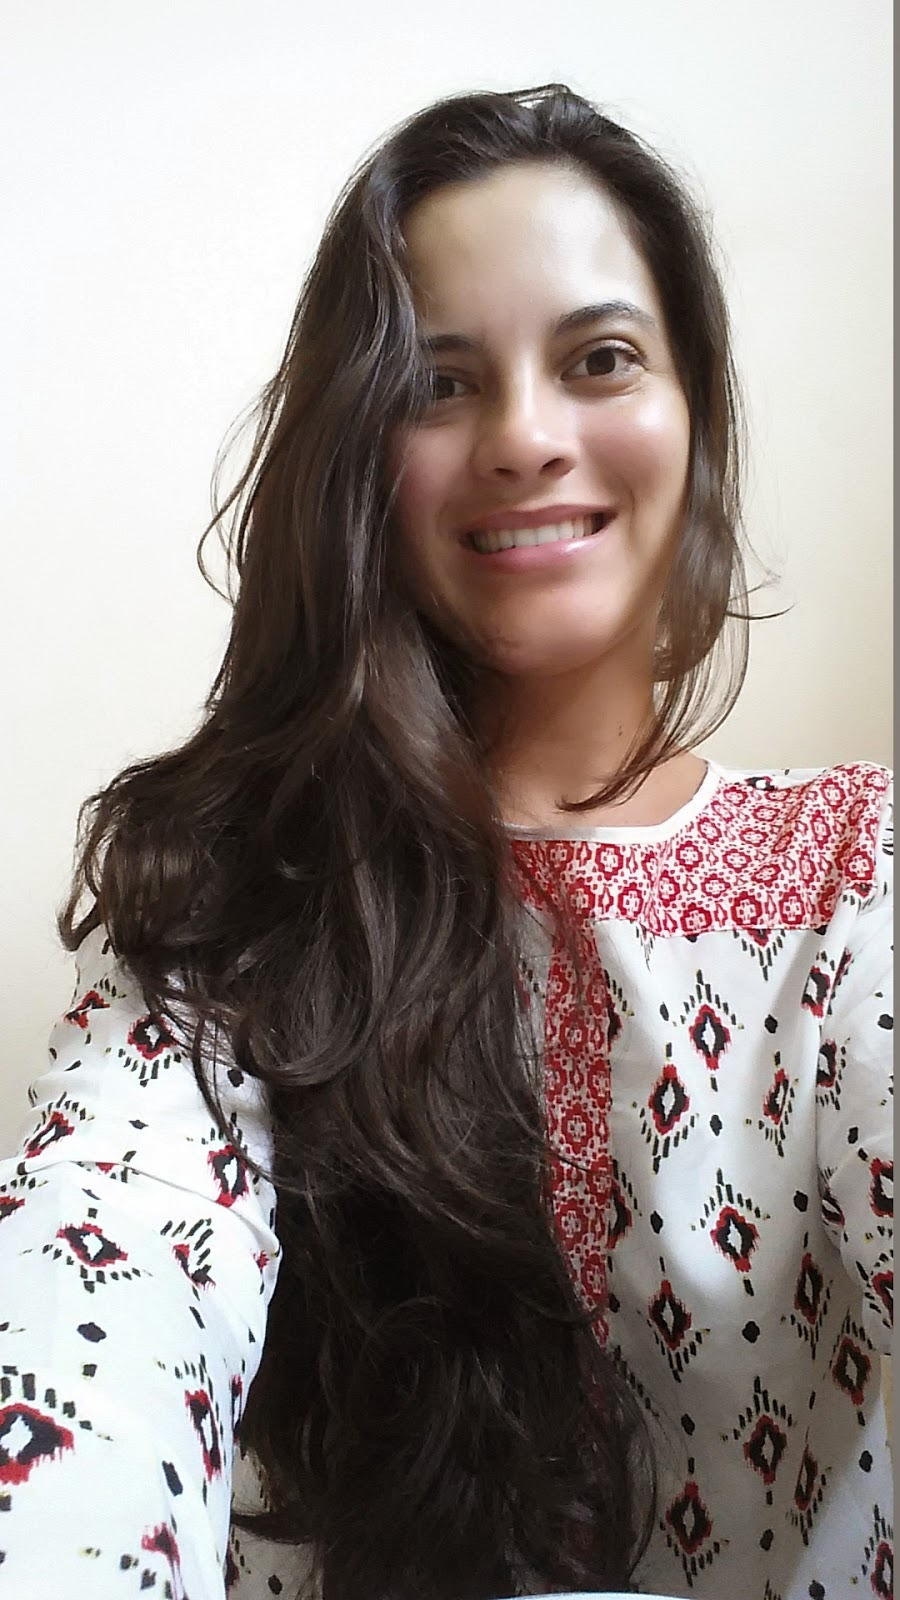 Olhar As Mulheres Braga-6070